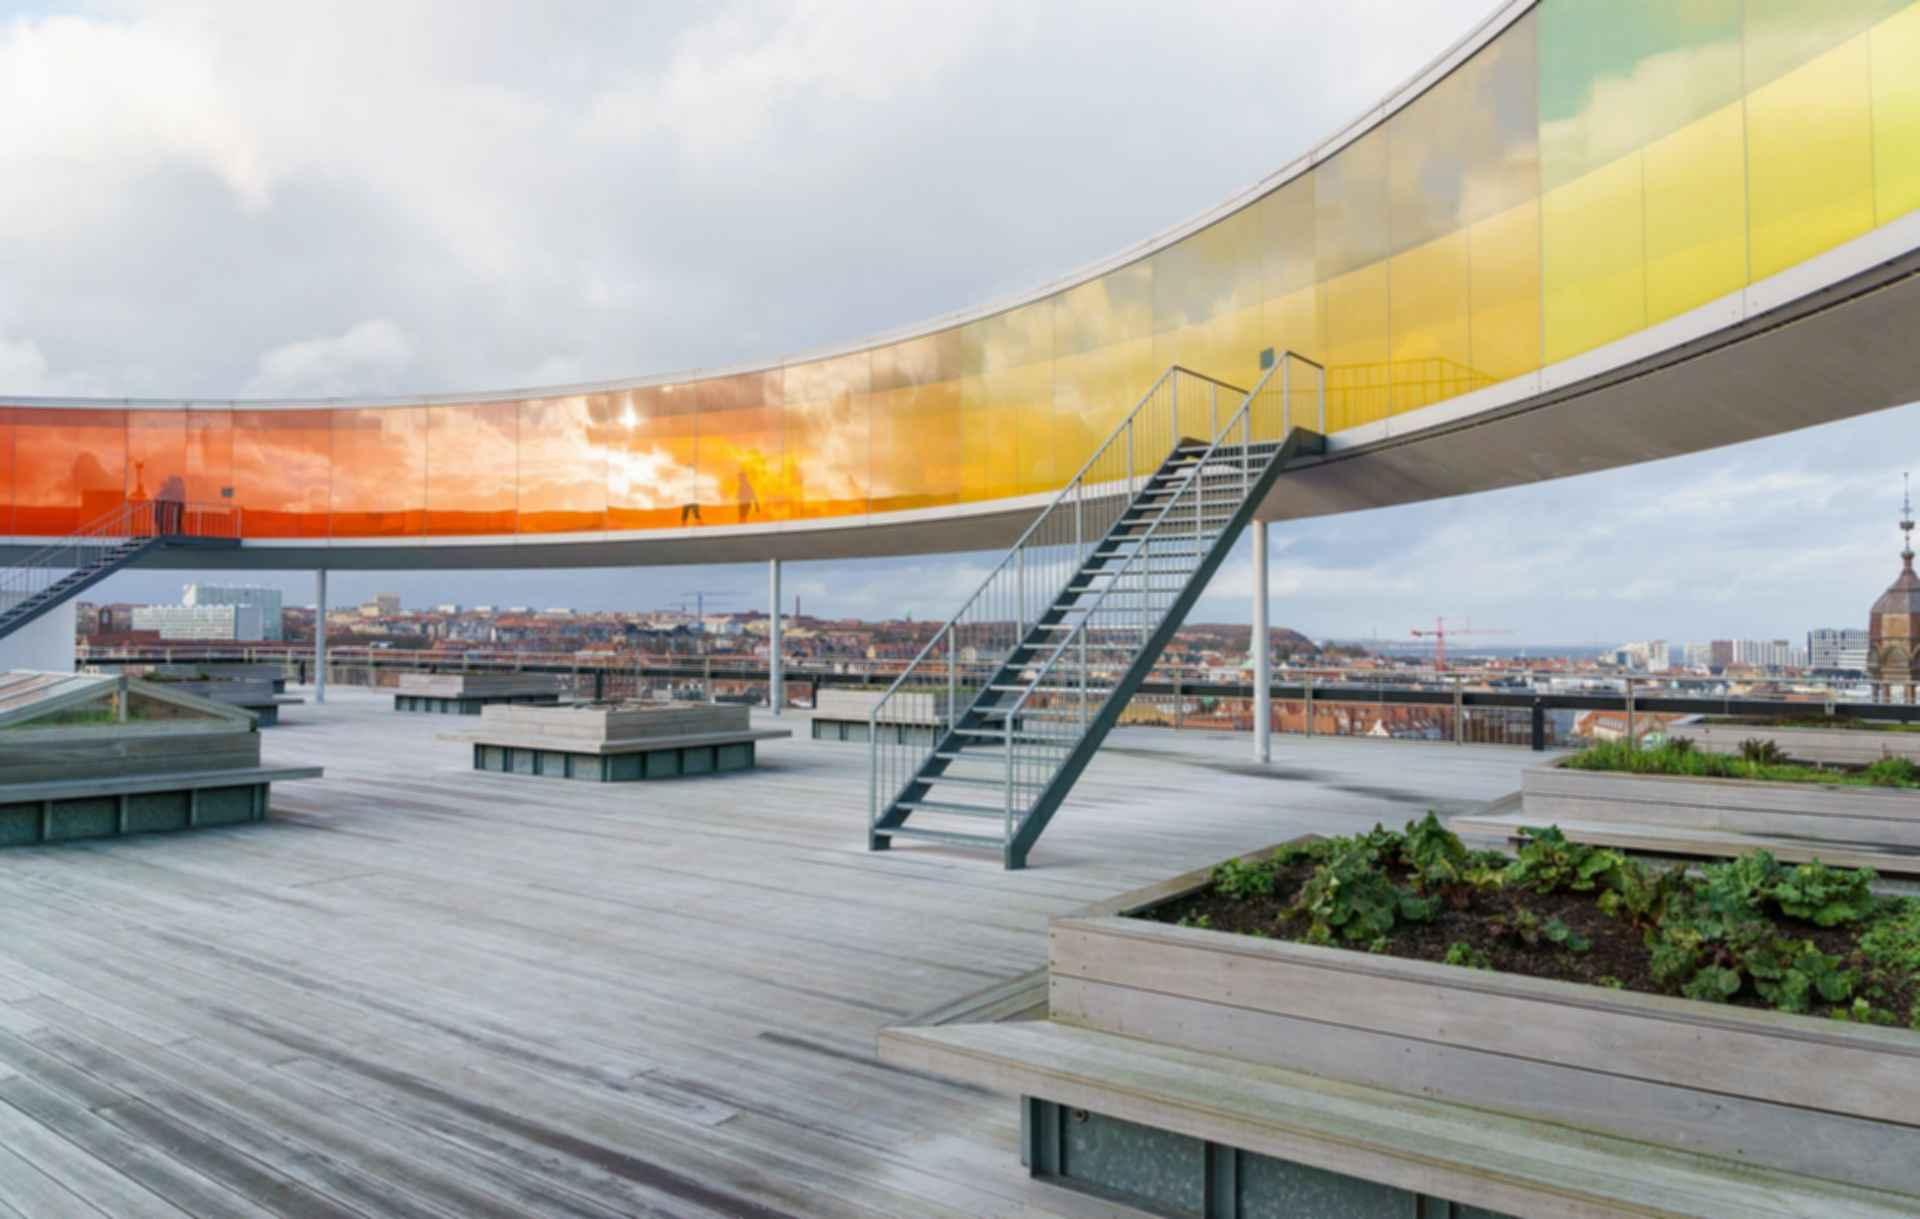 ARoS Aarhus Kunstmuseum - Rooftop Area